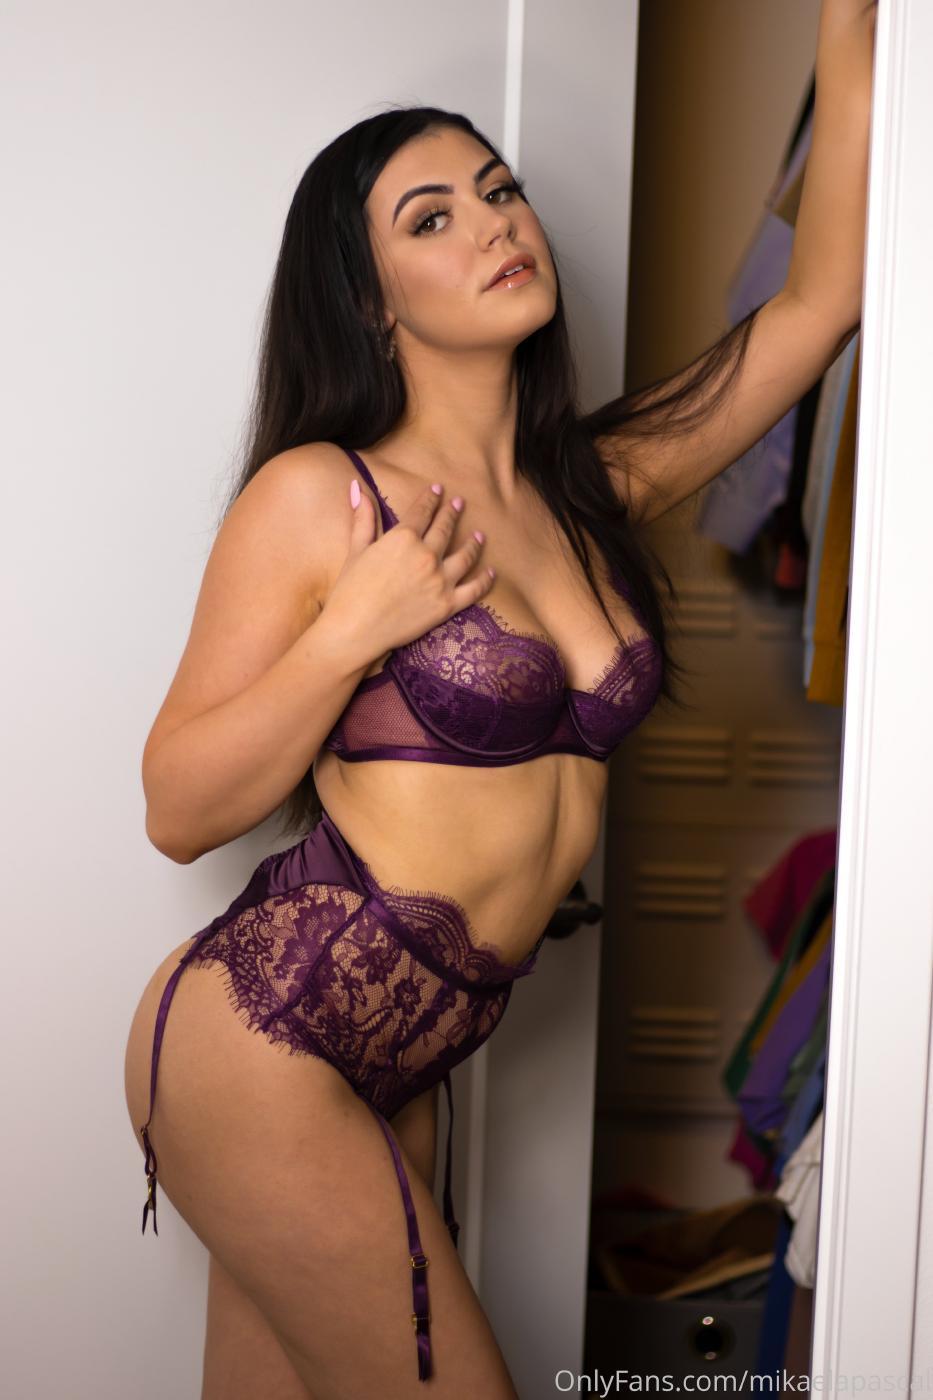 Mikaela Pascal Purple Lace Lingerie Onlyfans Set Leaked Kziwjx